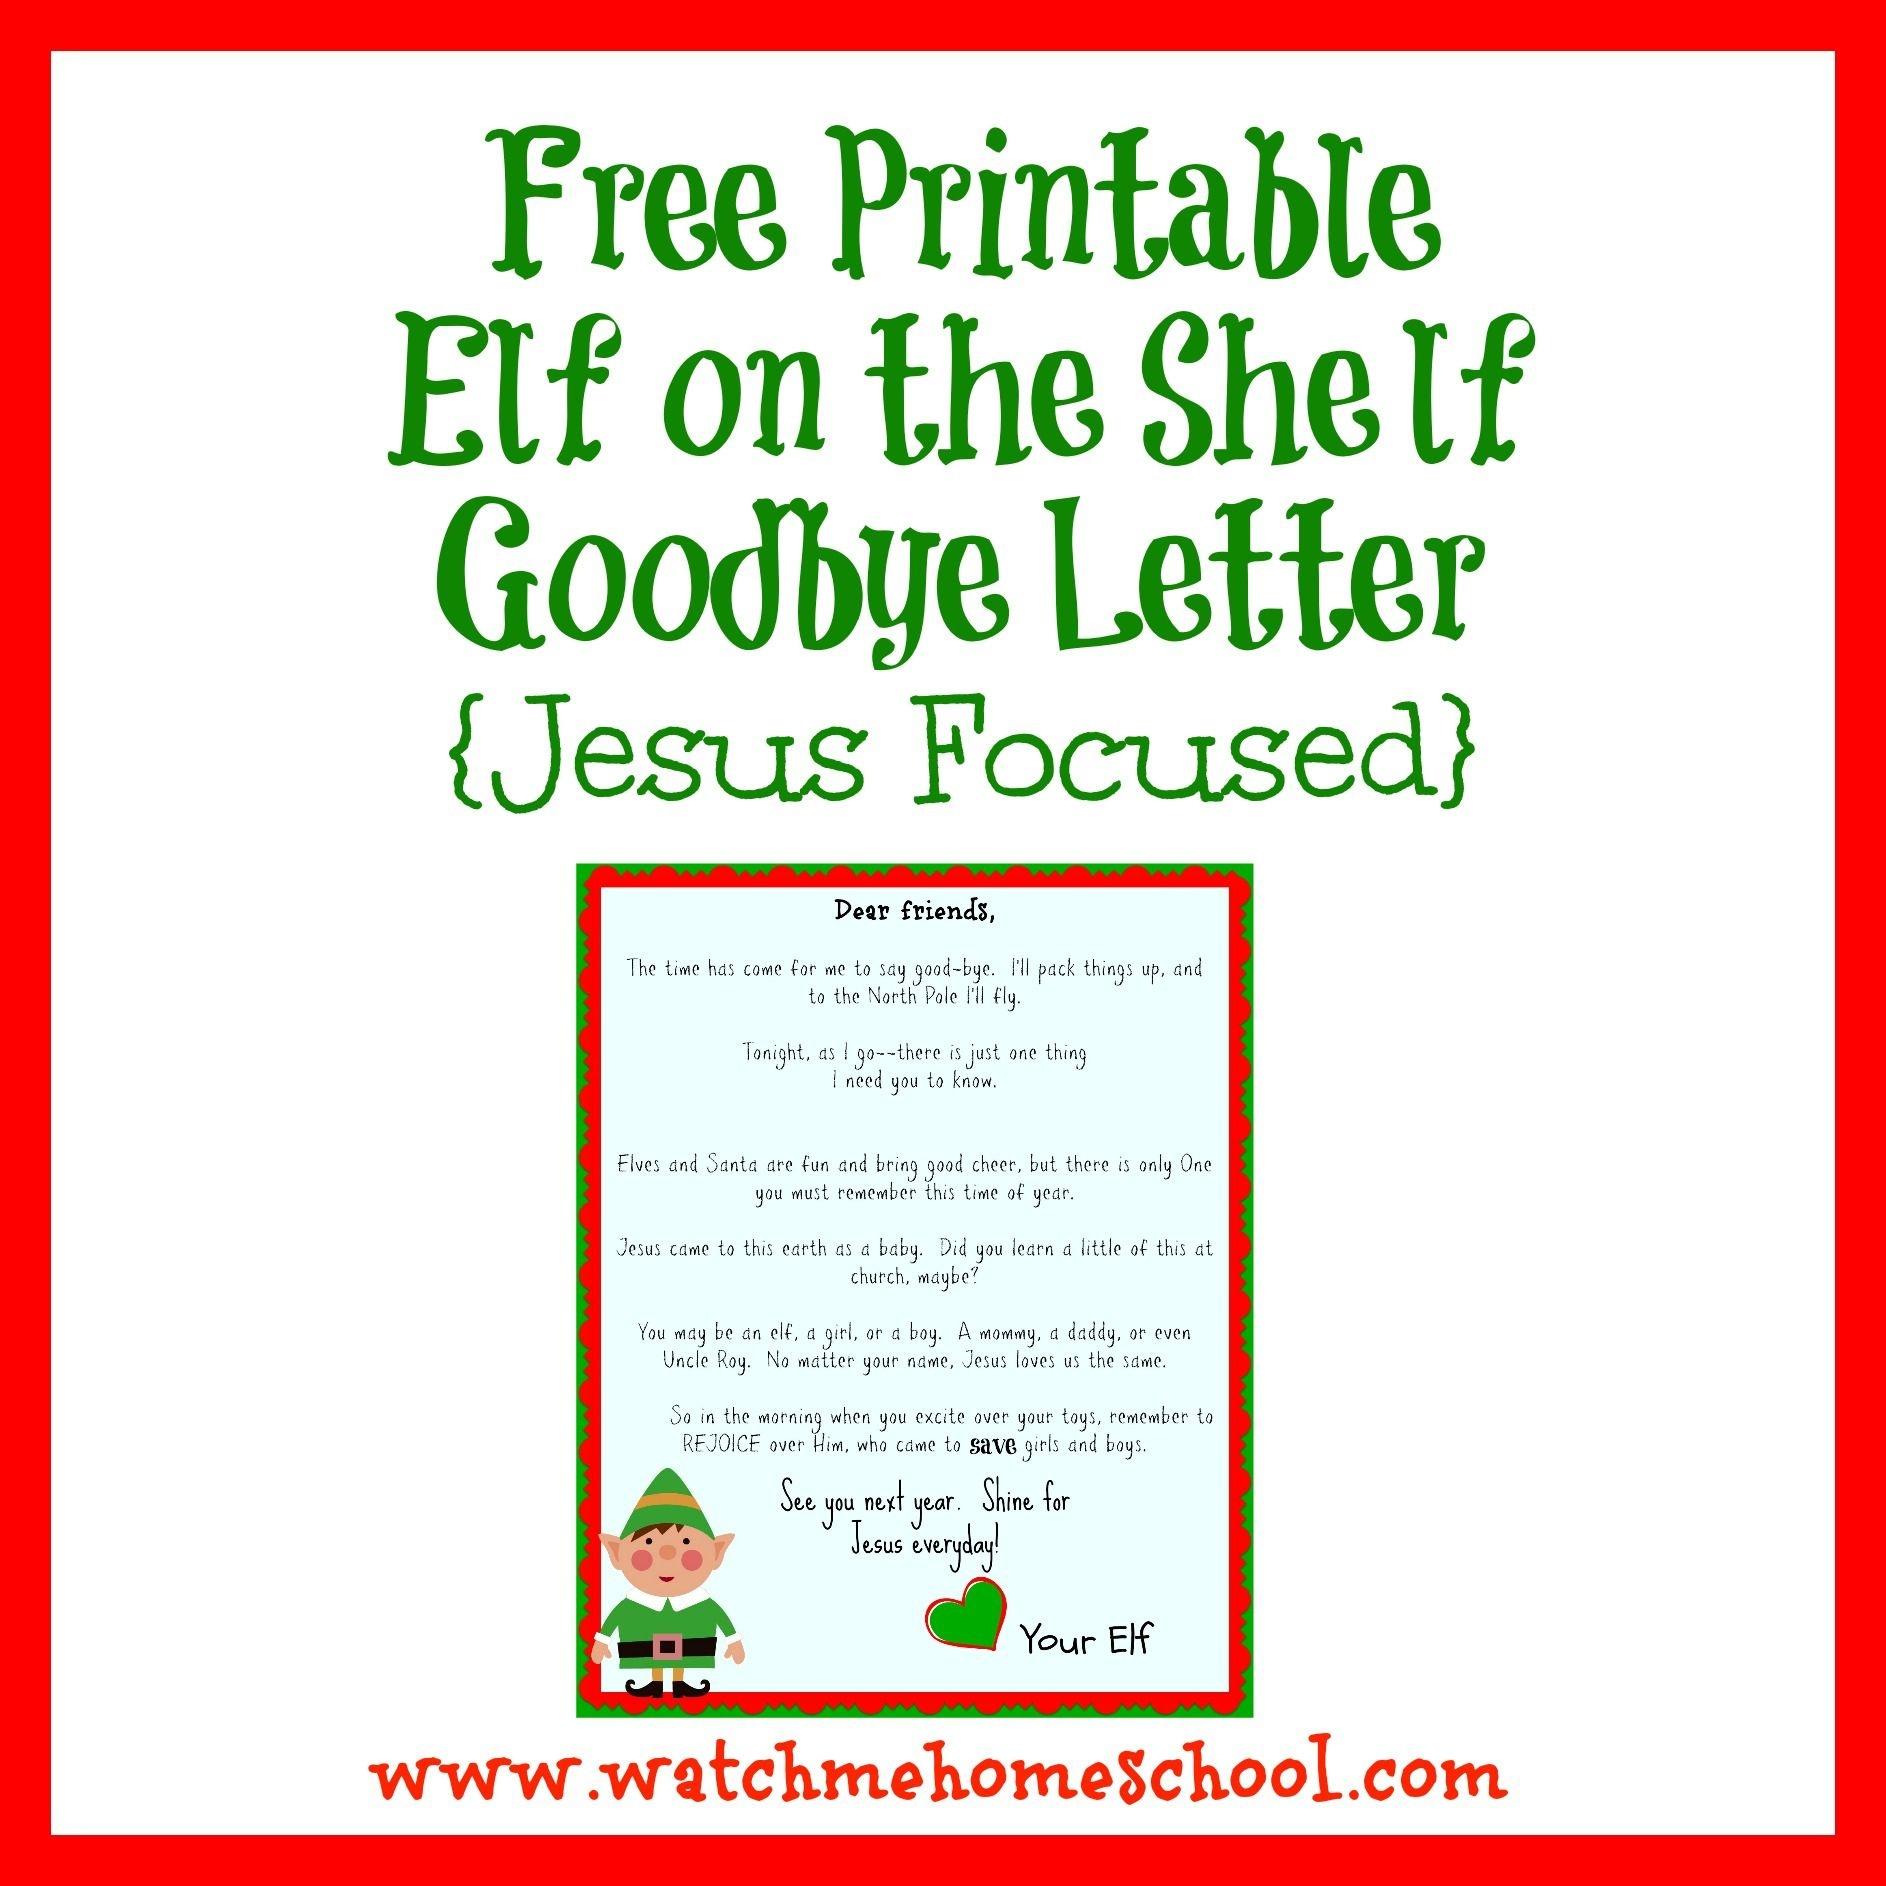 Elf On The Shelf Farewell Letter Printable | Elf On The Shelf | Elf - Elf On A Shelf Goodbye Letter Free Printable